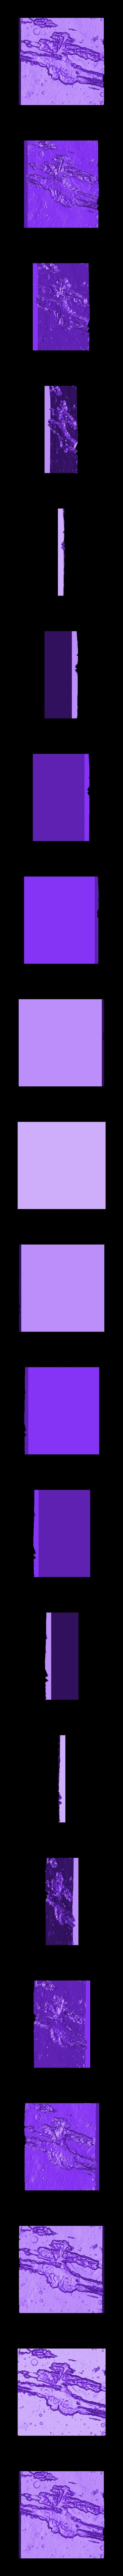 844da62e 36c0 4bf3 ac6d bf4d1c3e6c23